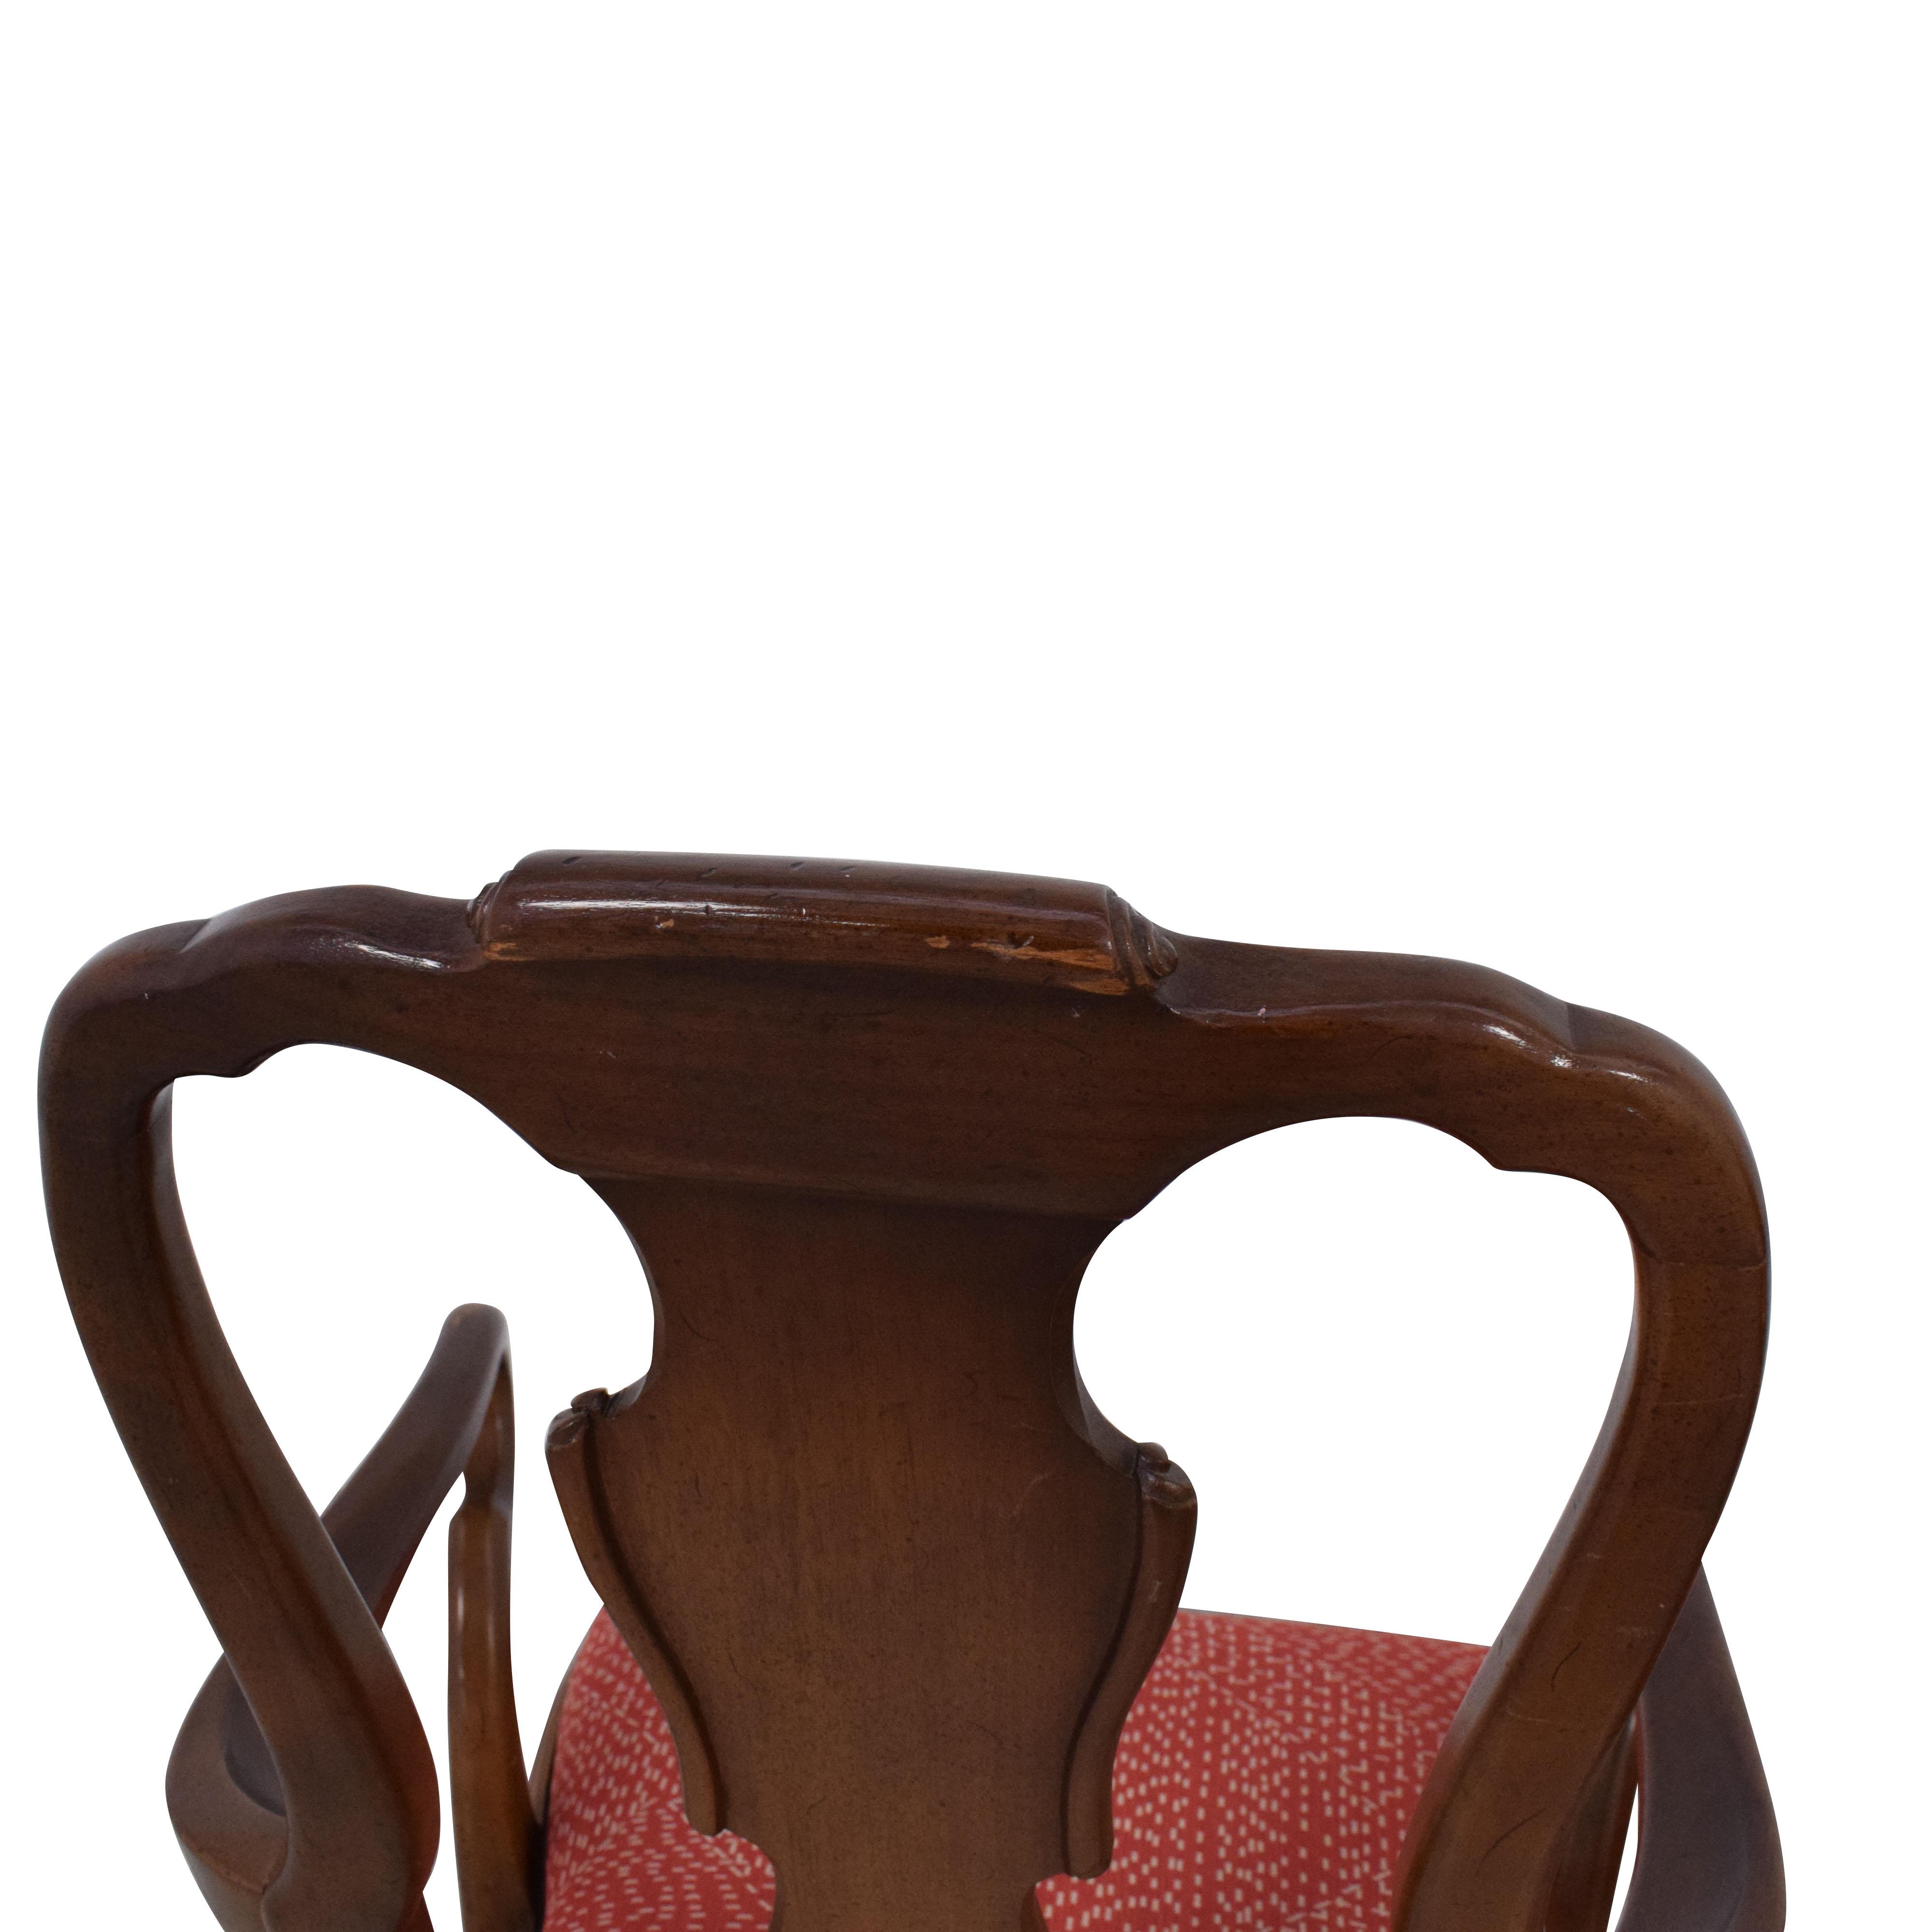 Henredon Furniture Henredon Queen Anne Chairs